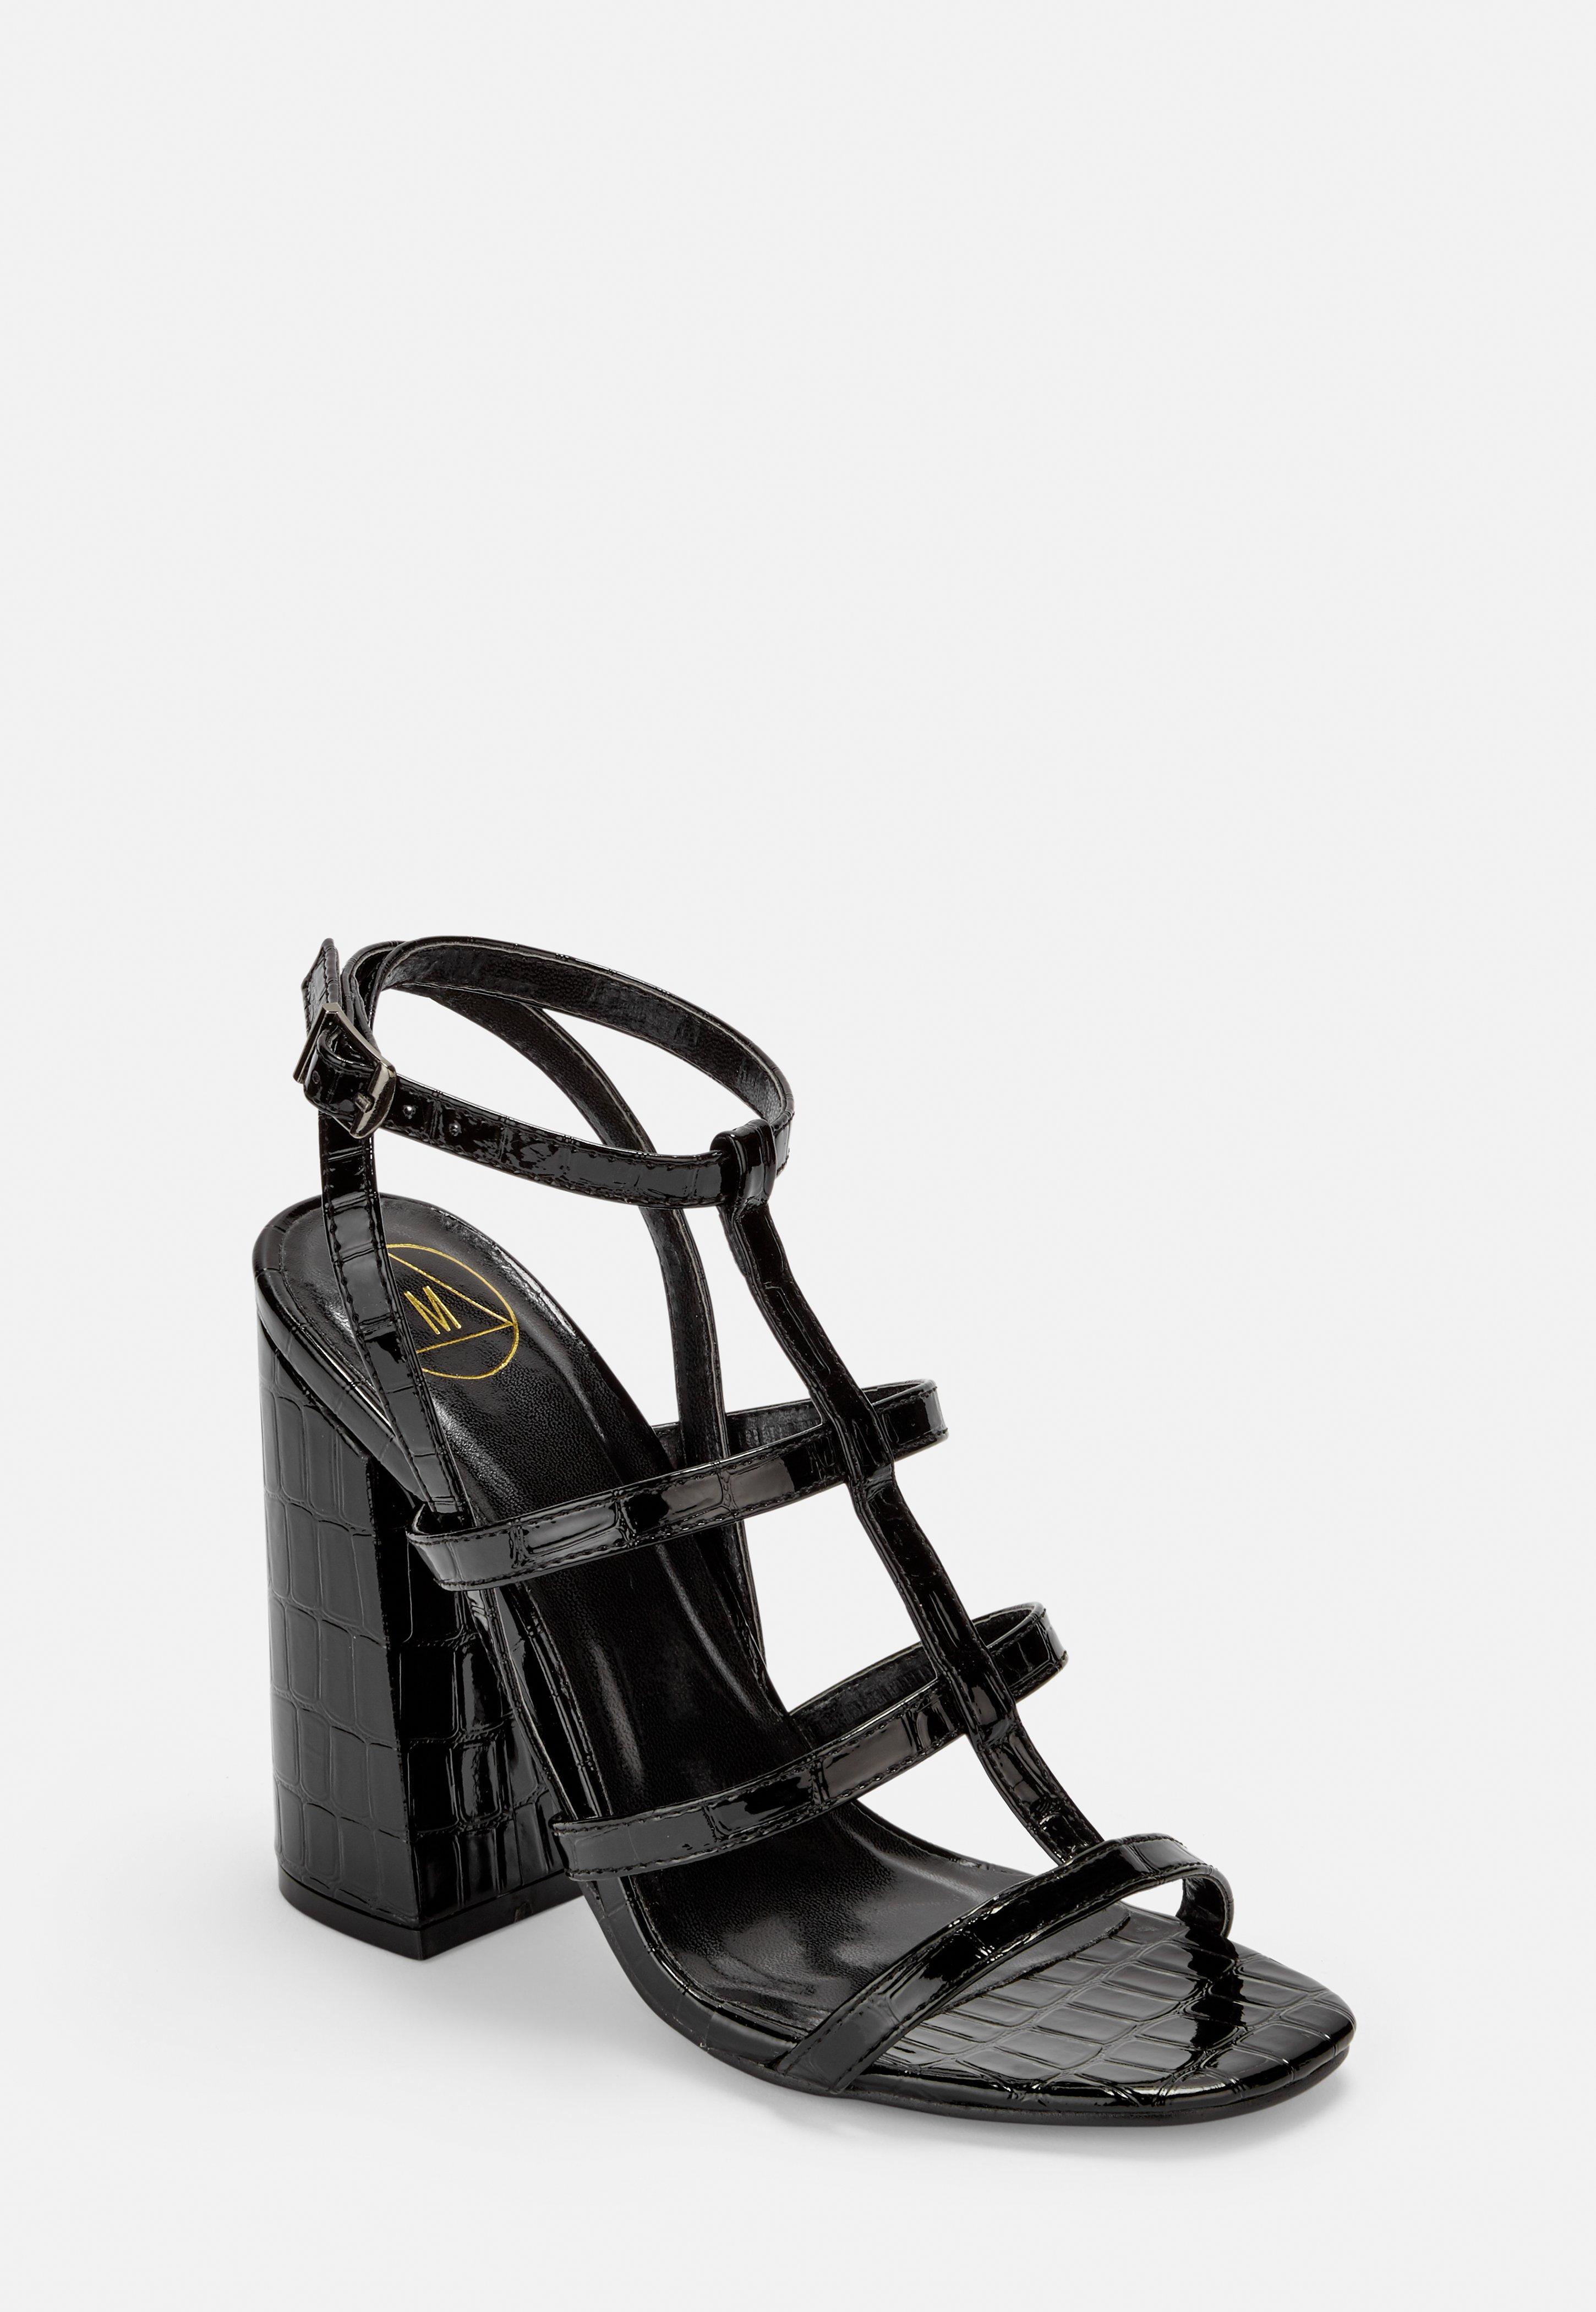 Chaussures Andres Noir Antik 39 Machado 5jRL4A3